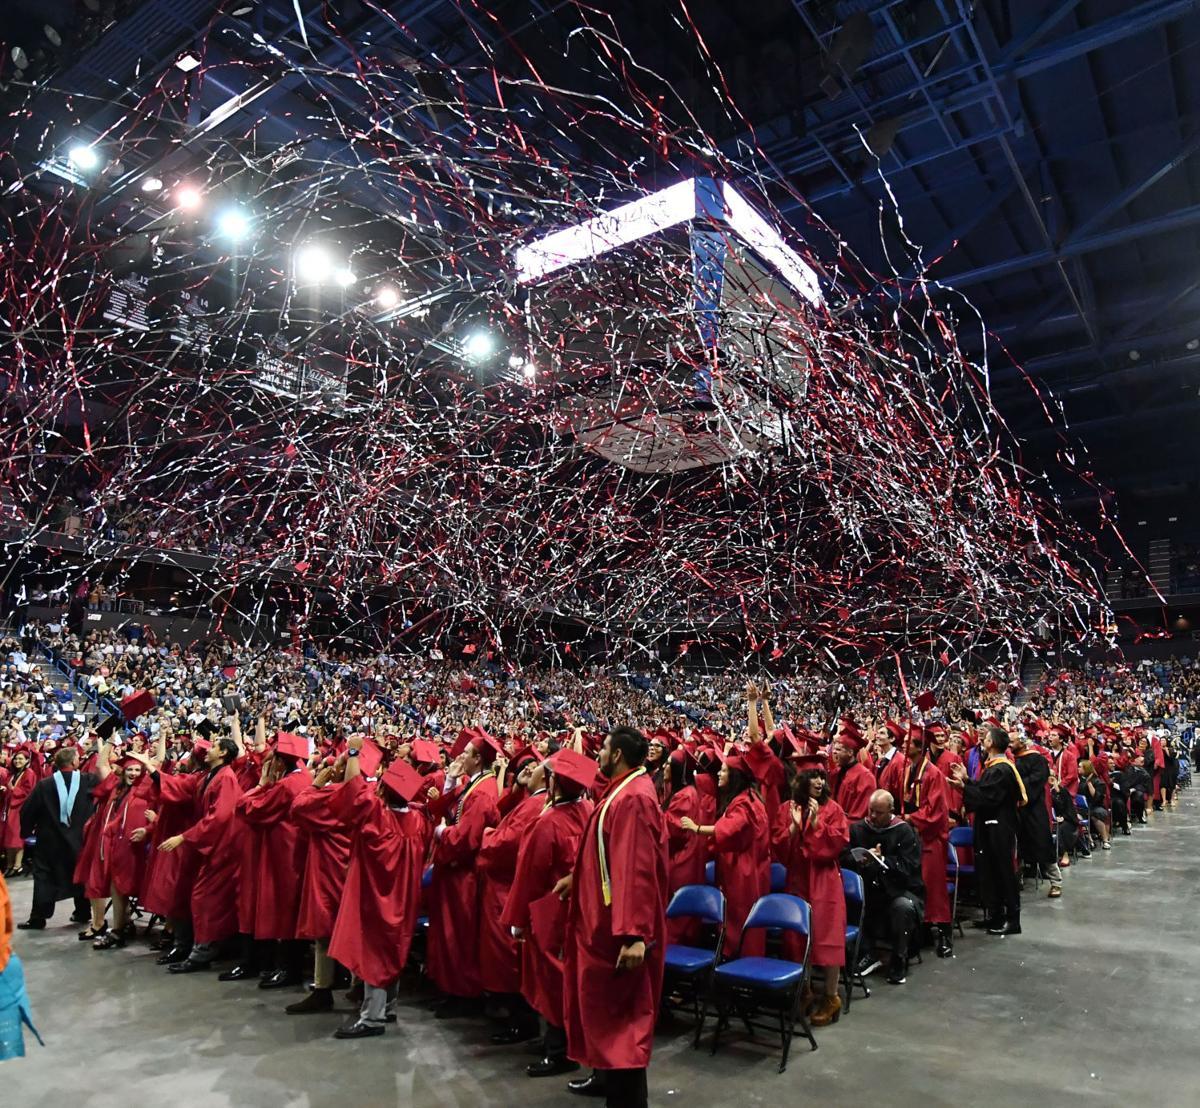 Ayala High School Class of 2019 graduation ceremony May 29, 2019